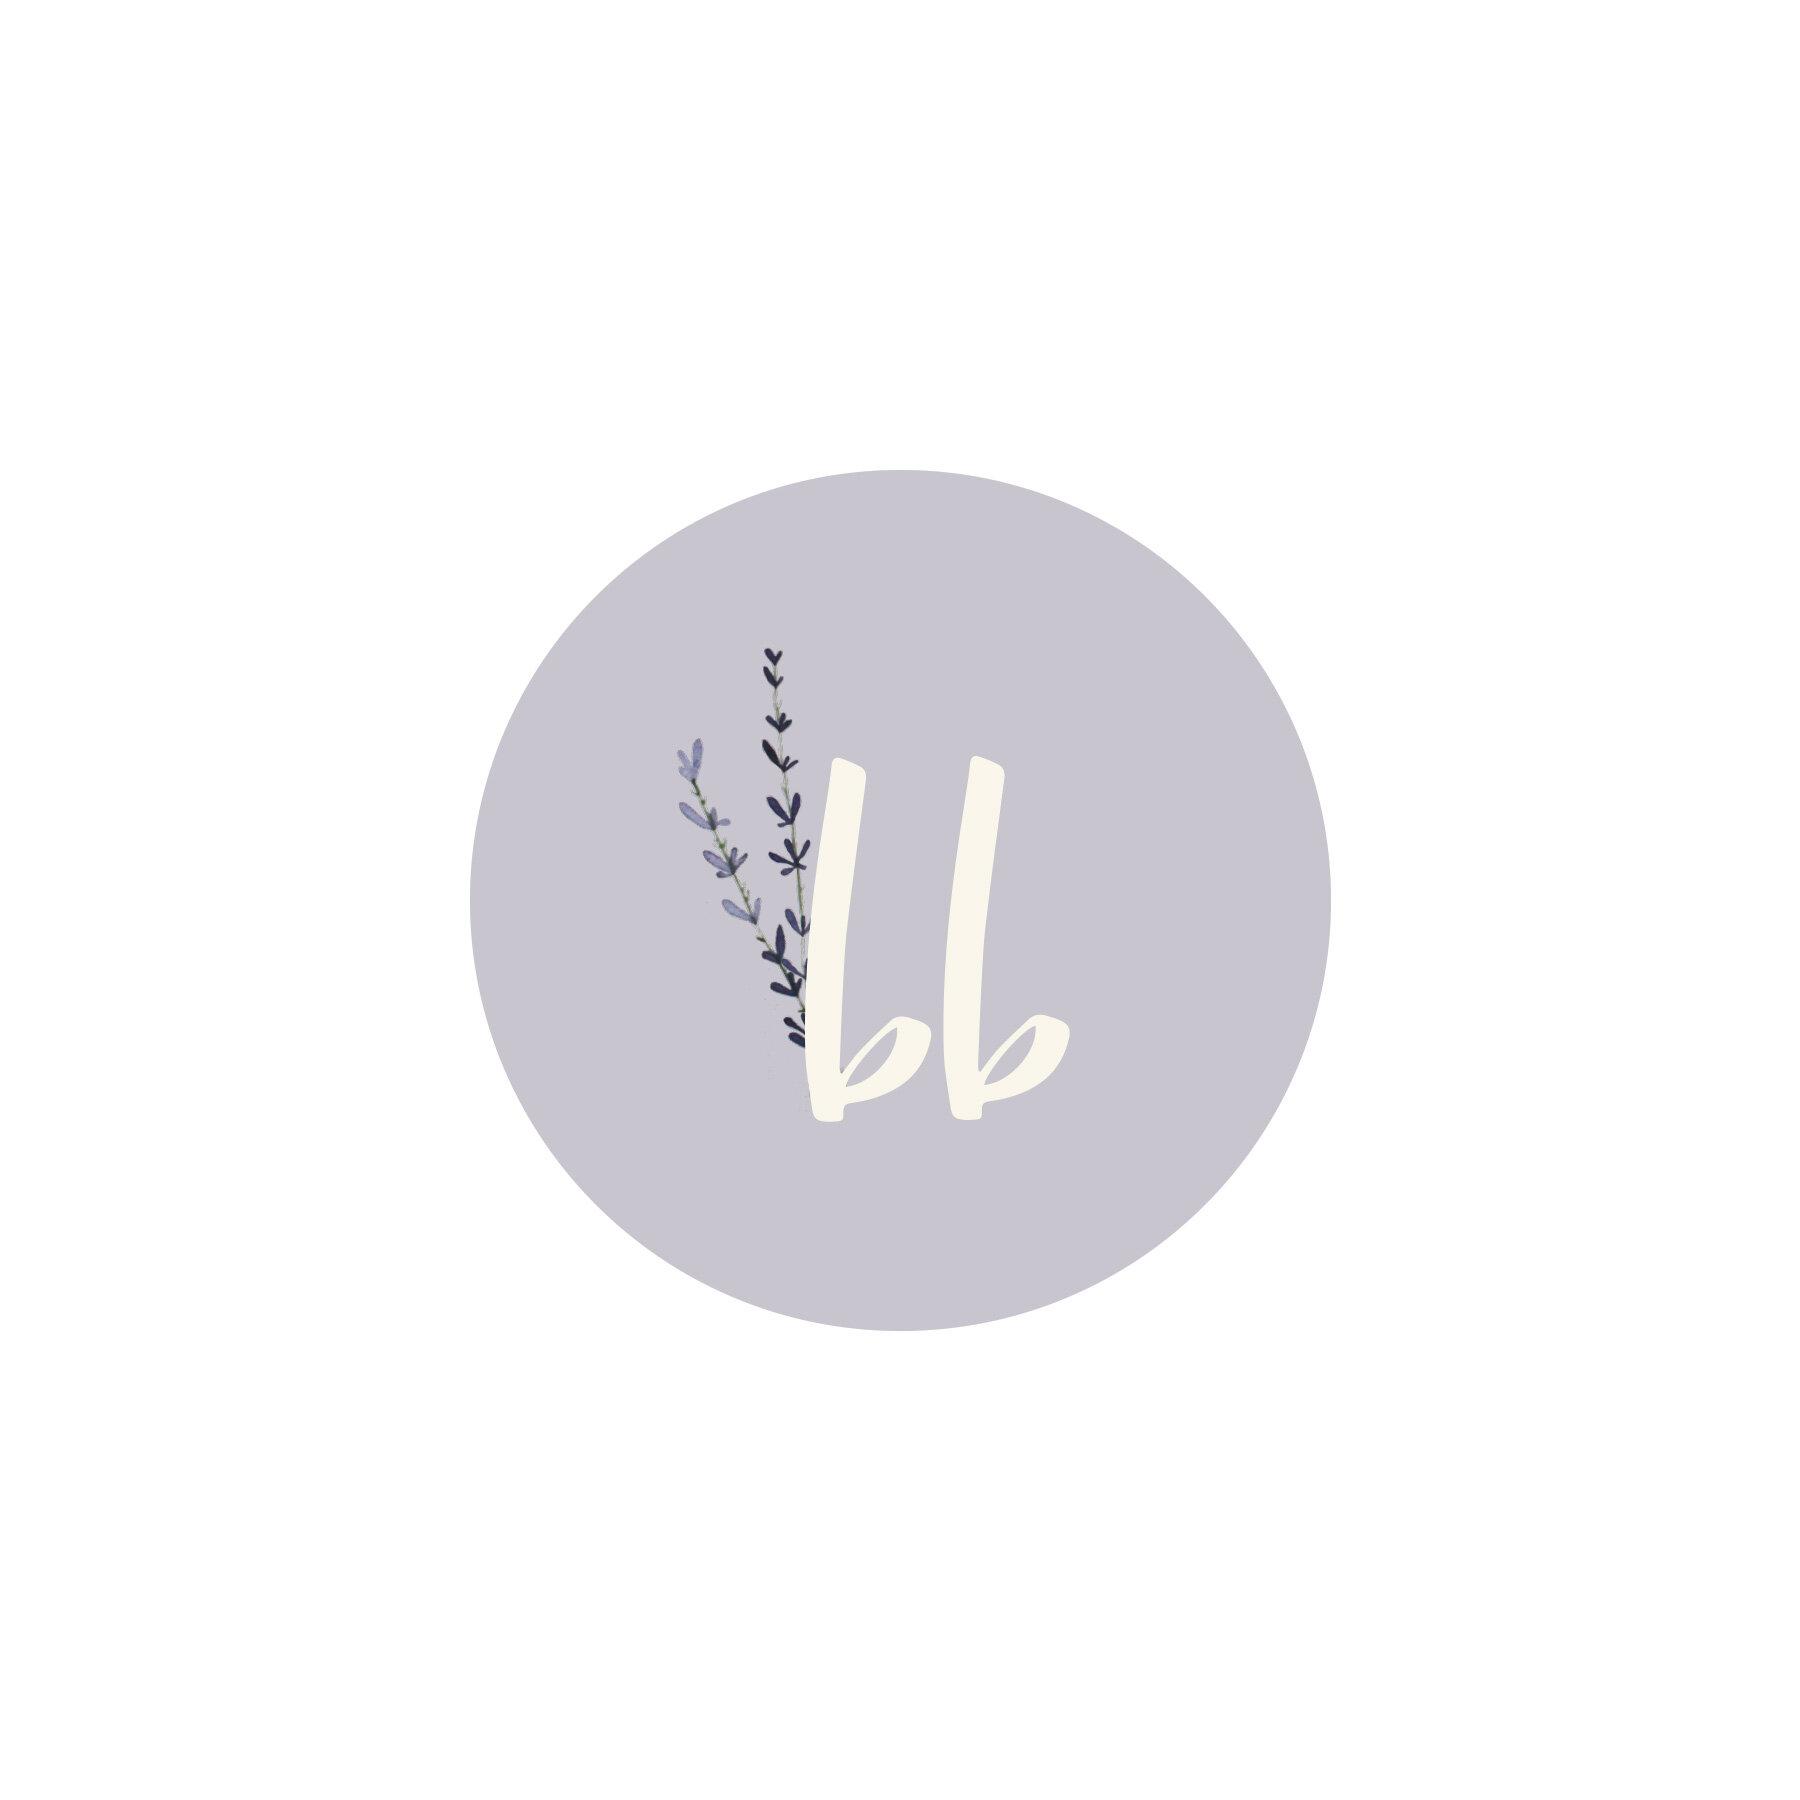 BB_MiniLogo_lavender.jpg